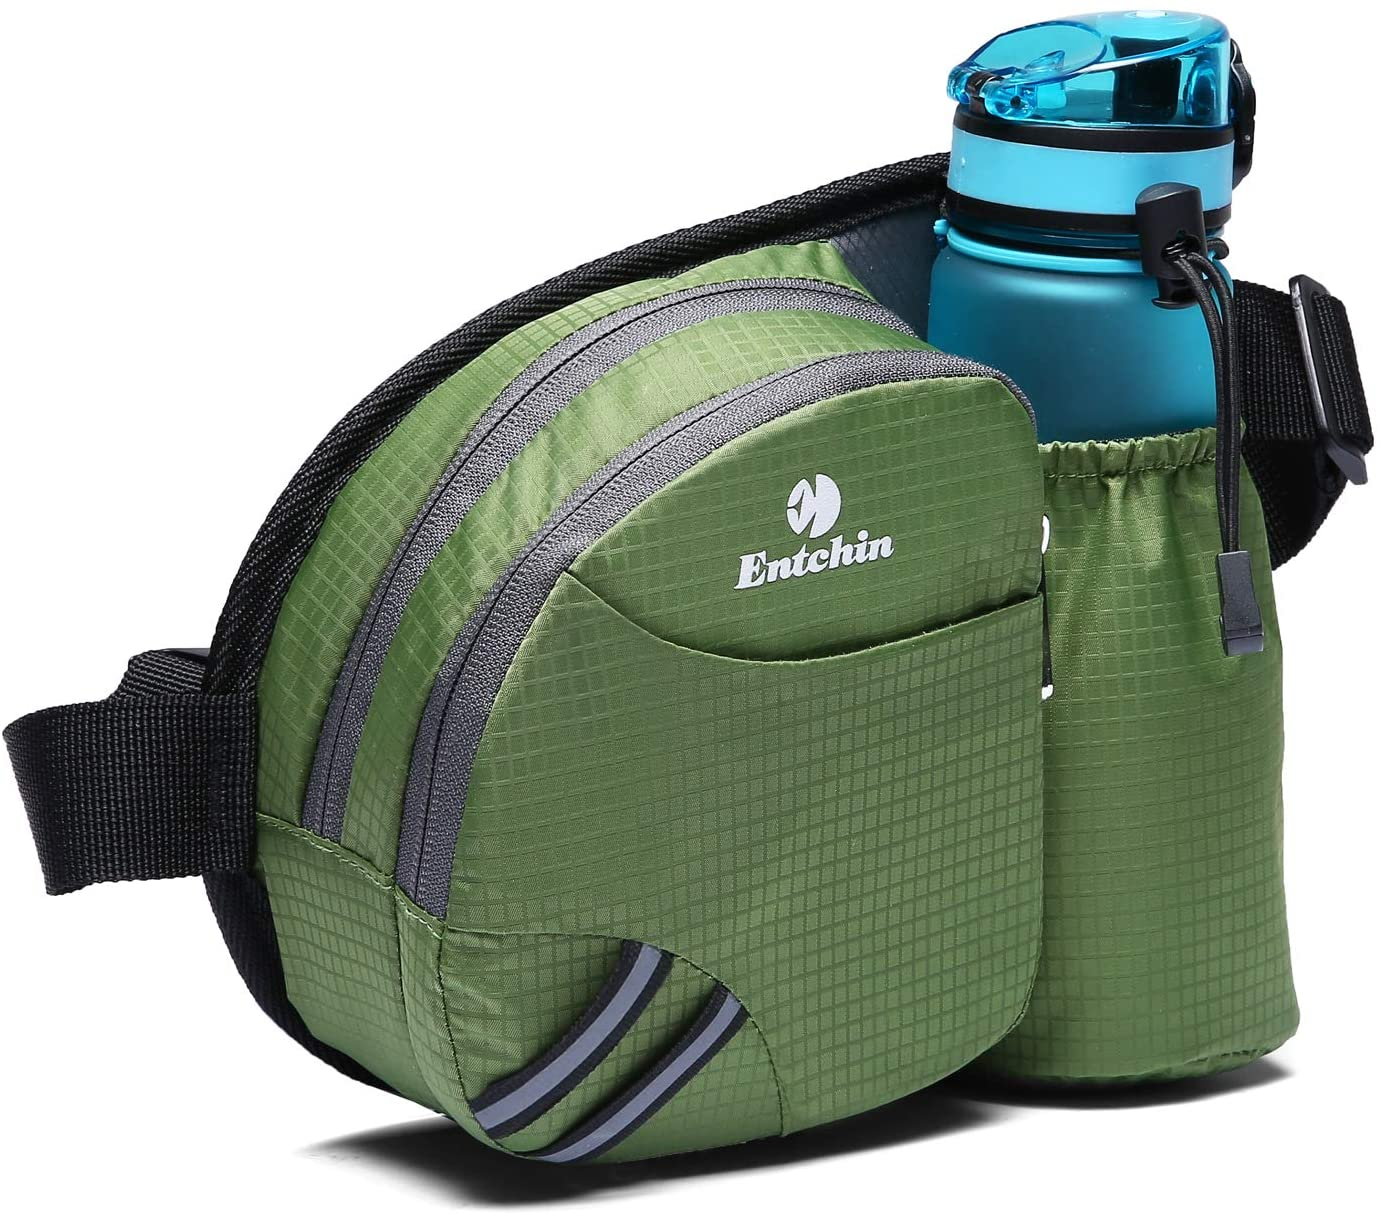 Entchin Fanny Pack with Water Bottle Holder for Women Men Hiking Running Dog Walking Waist Hip Bum Bag